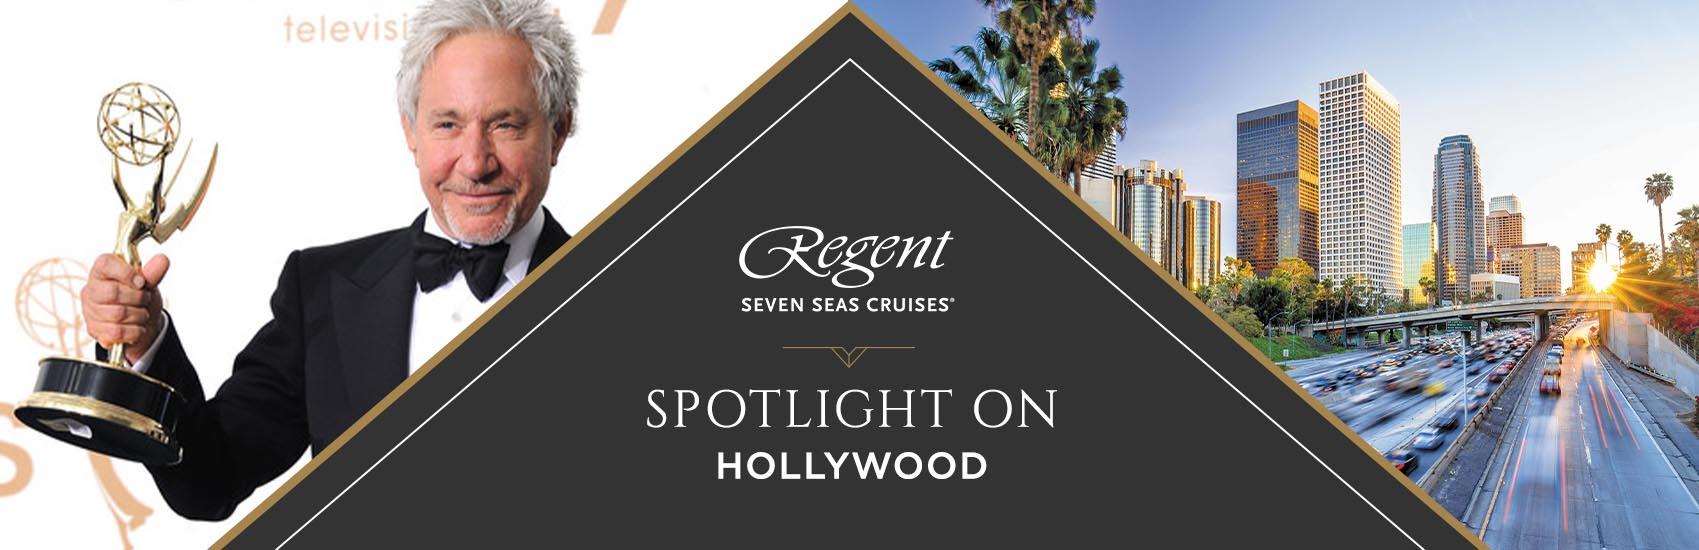 Bonus Savings with Regent Seven Seas 1